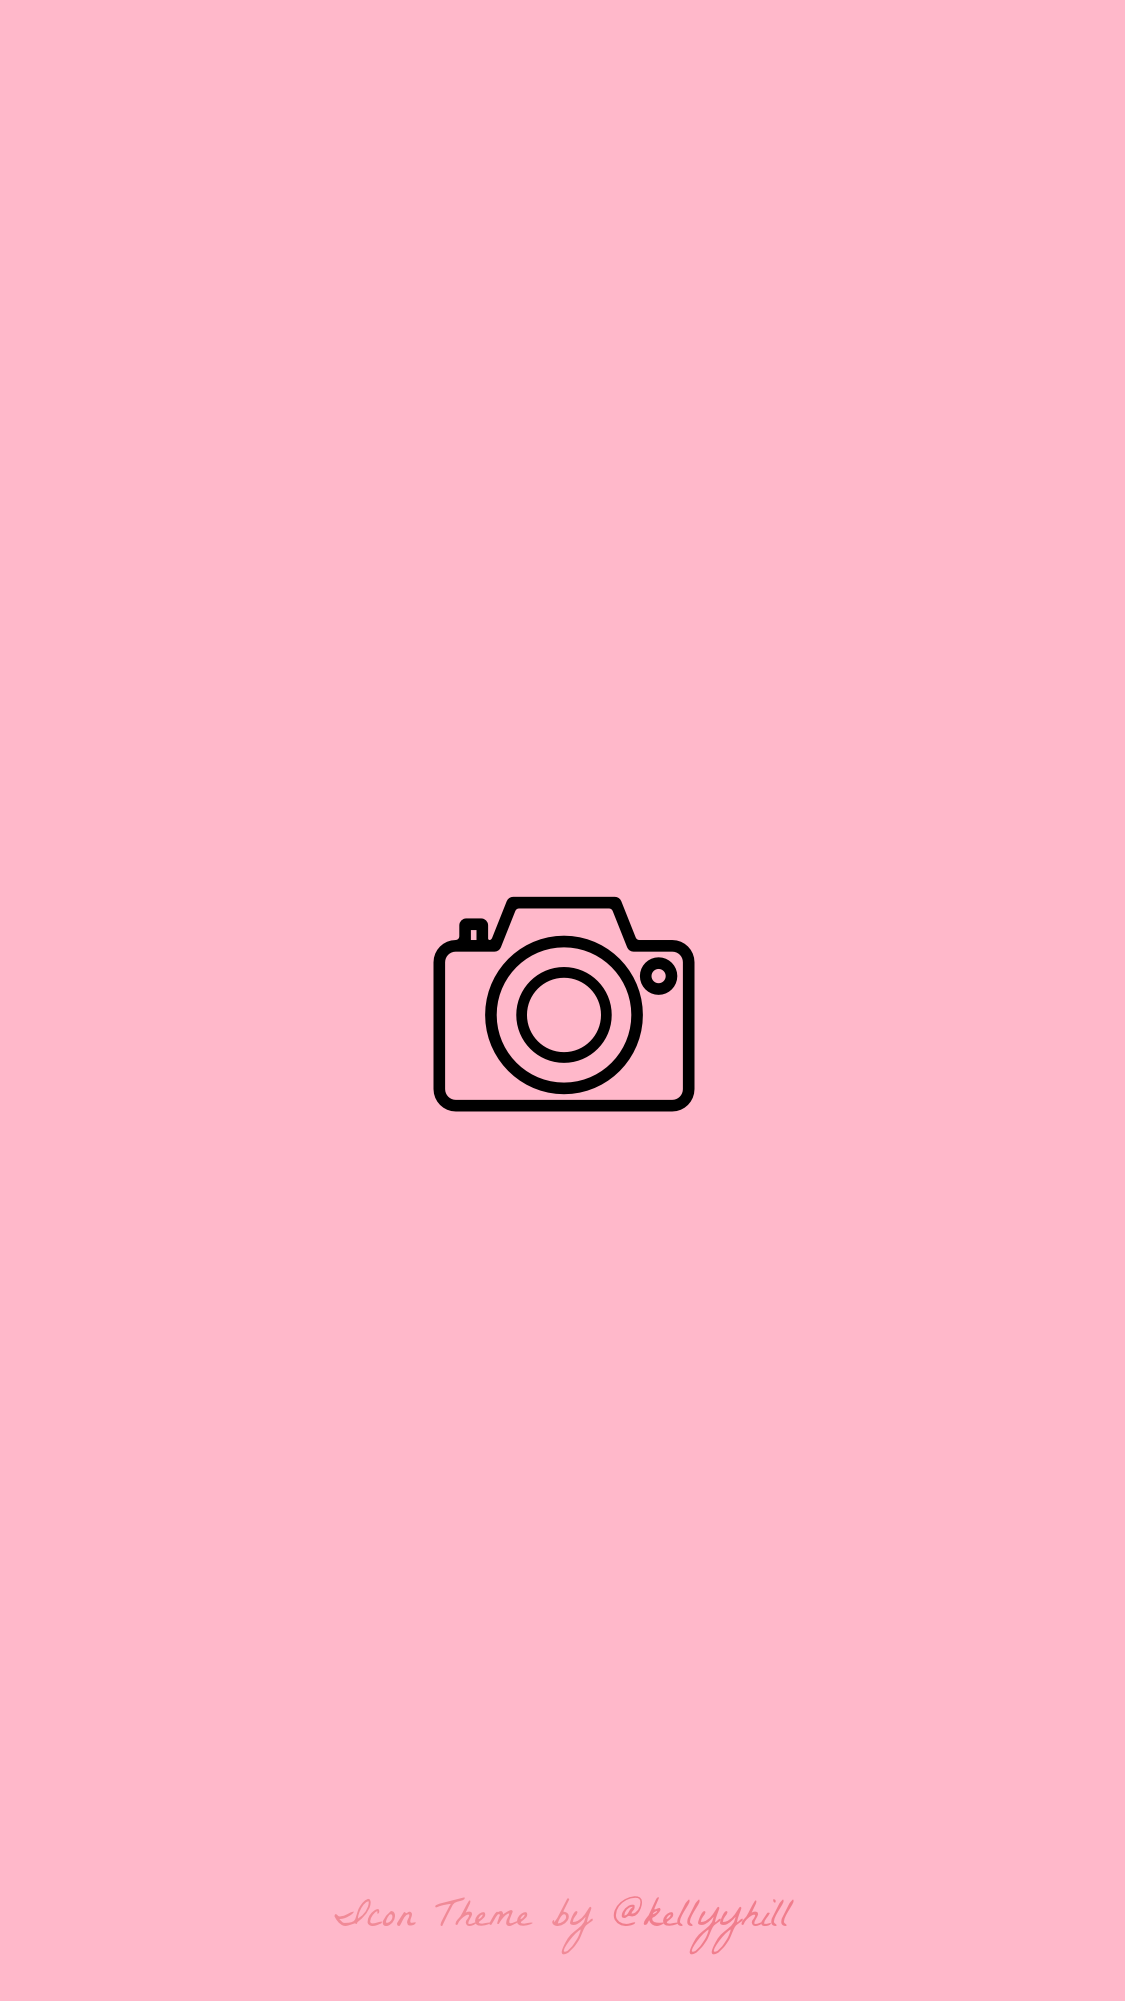 Pink Instagram Logo : instagram, Kelly, Instagram, Highlights, Template, Paradise, Icons, Instagram,